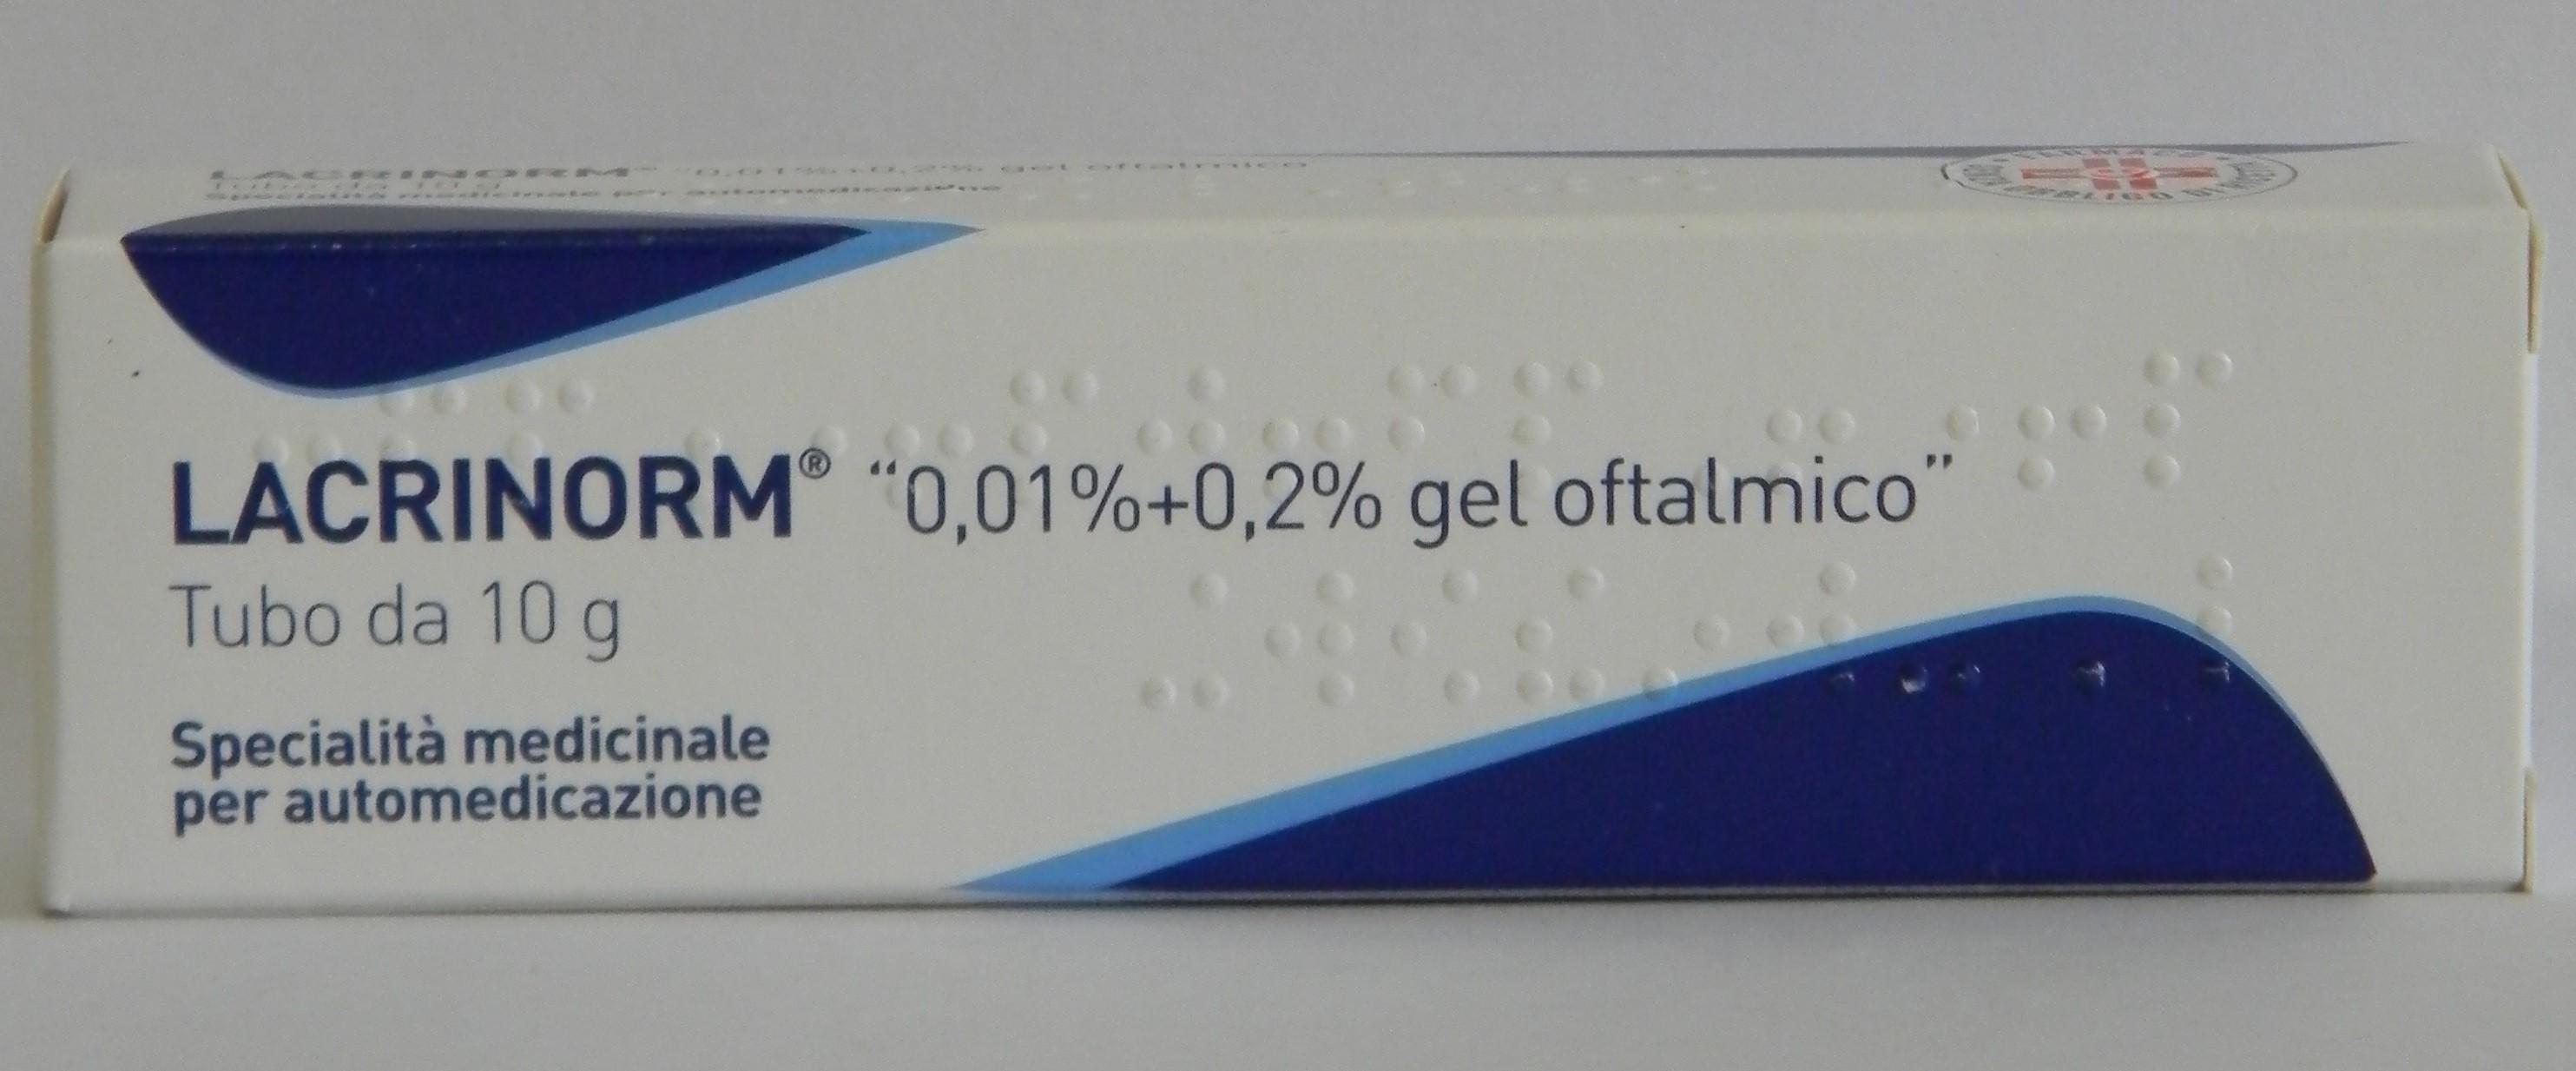 Lacrinorm 0,01% + 0,2% Gel Oftalmico Tubo 10 G